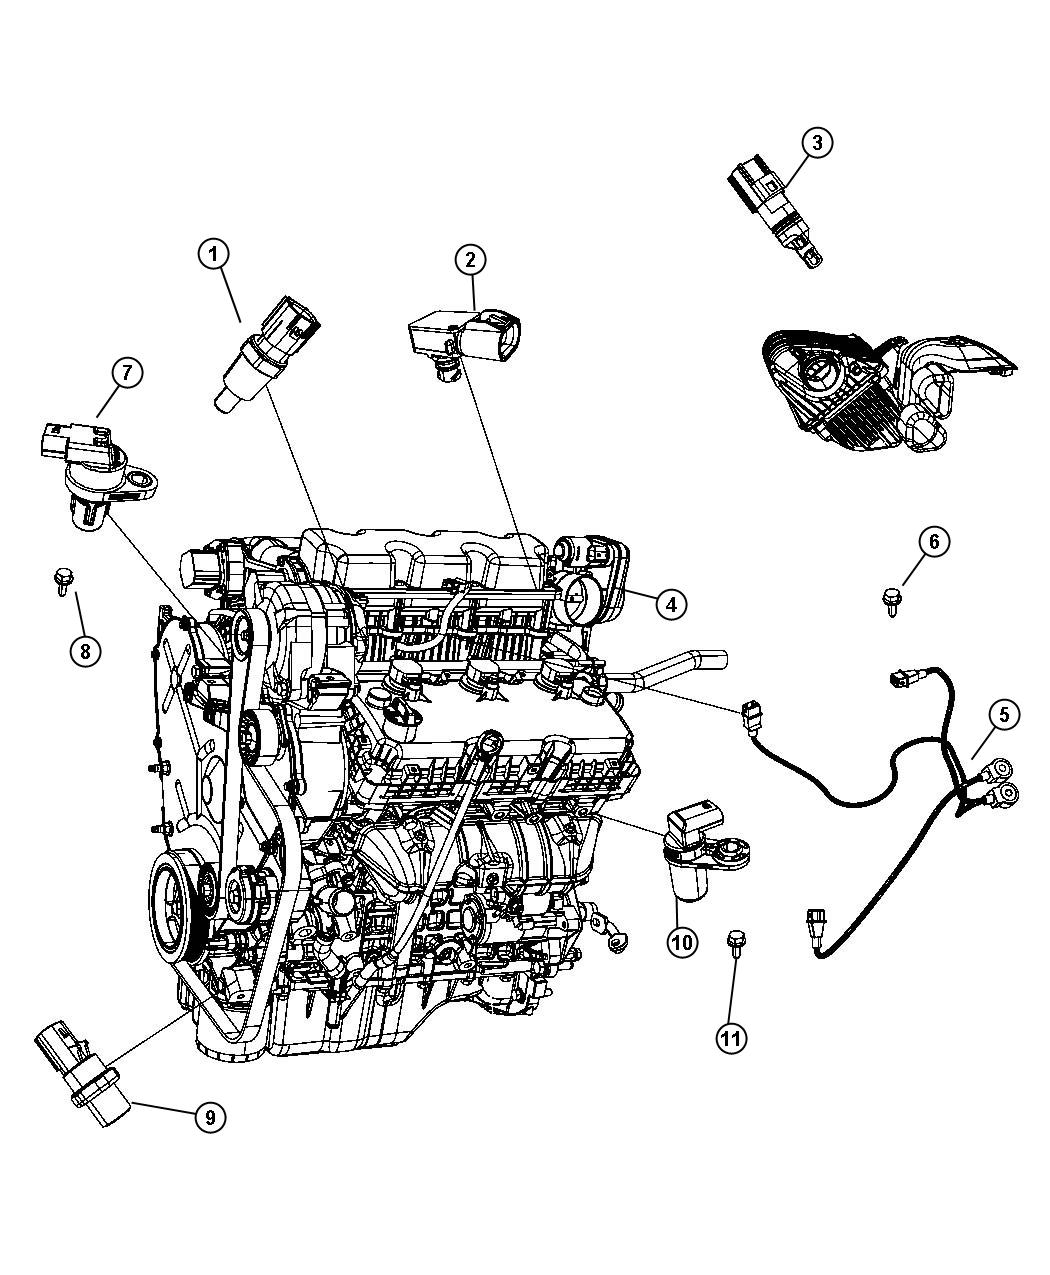 hight resolution of lincoln mark viii fuse box lexus sc300 fuse box wiring 2014 dodge avenger engine diagram dodge